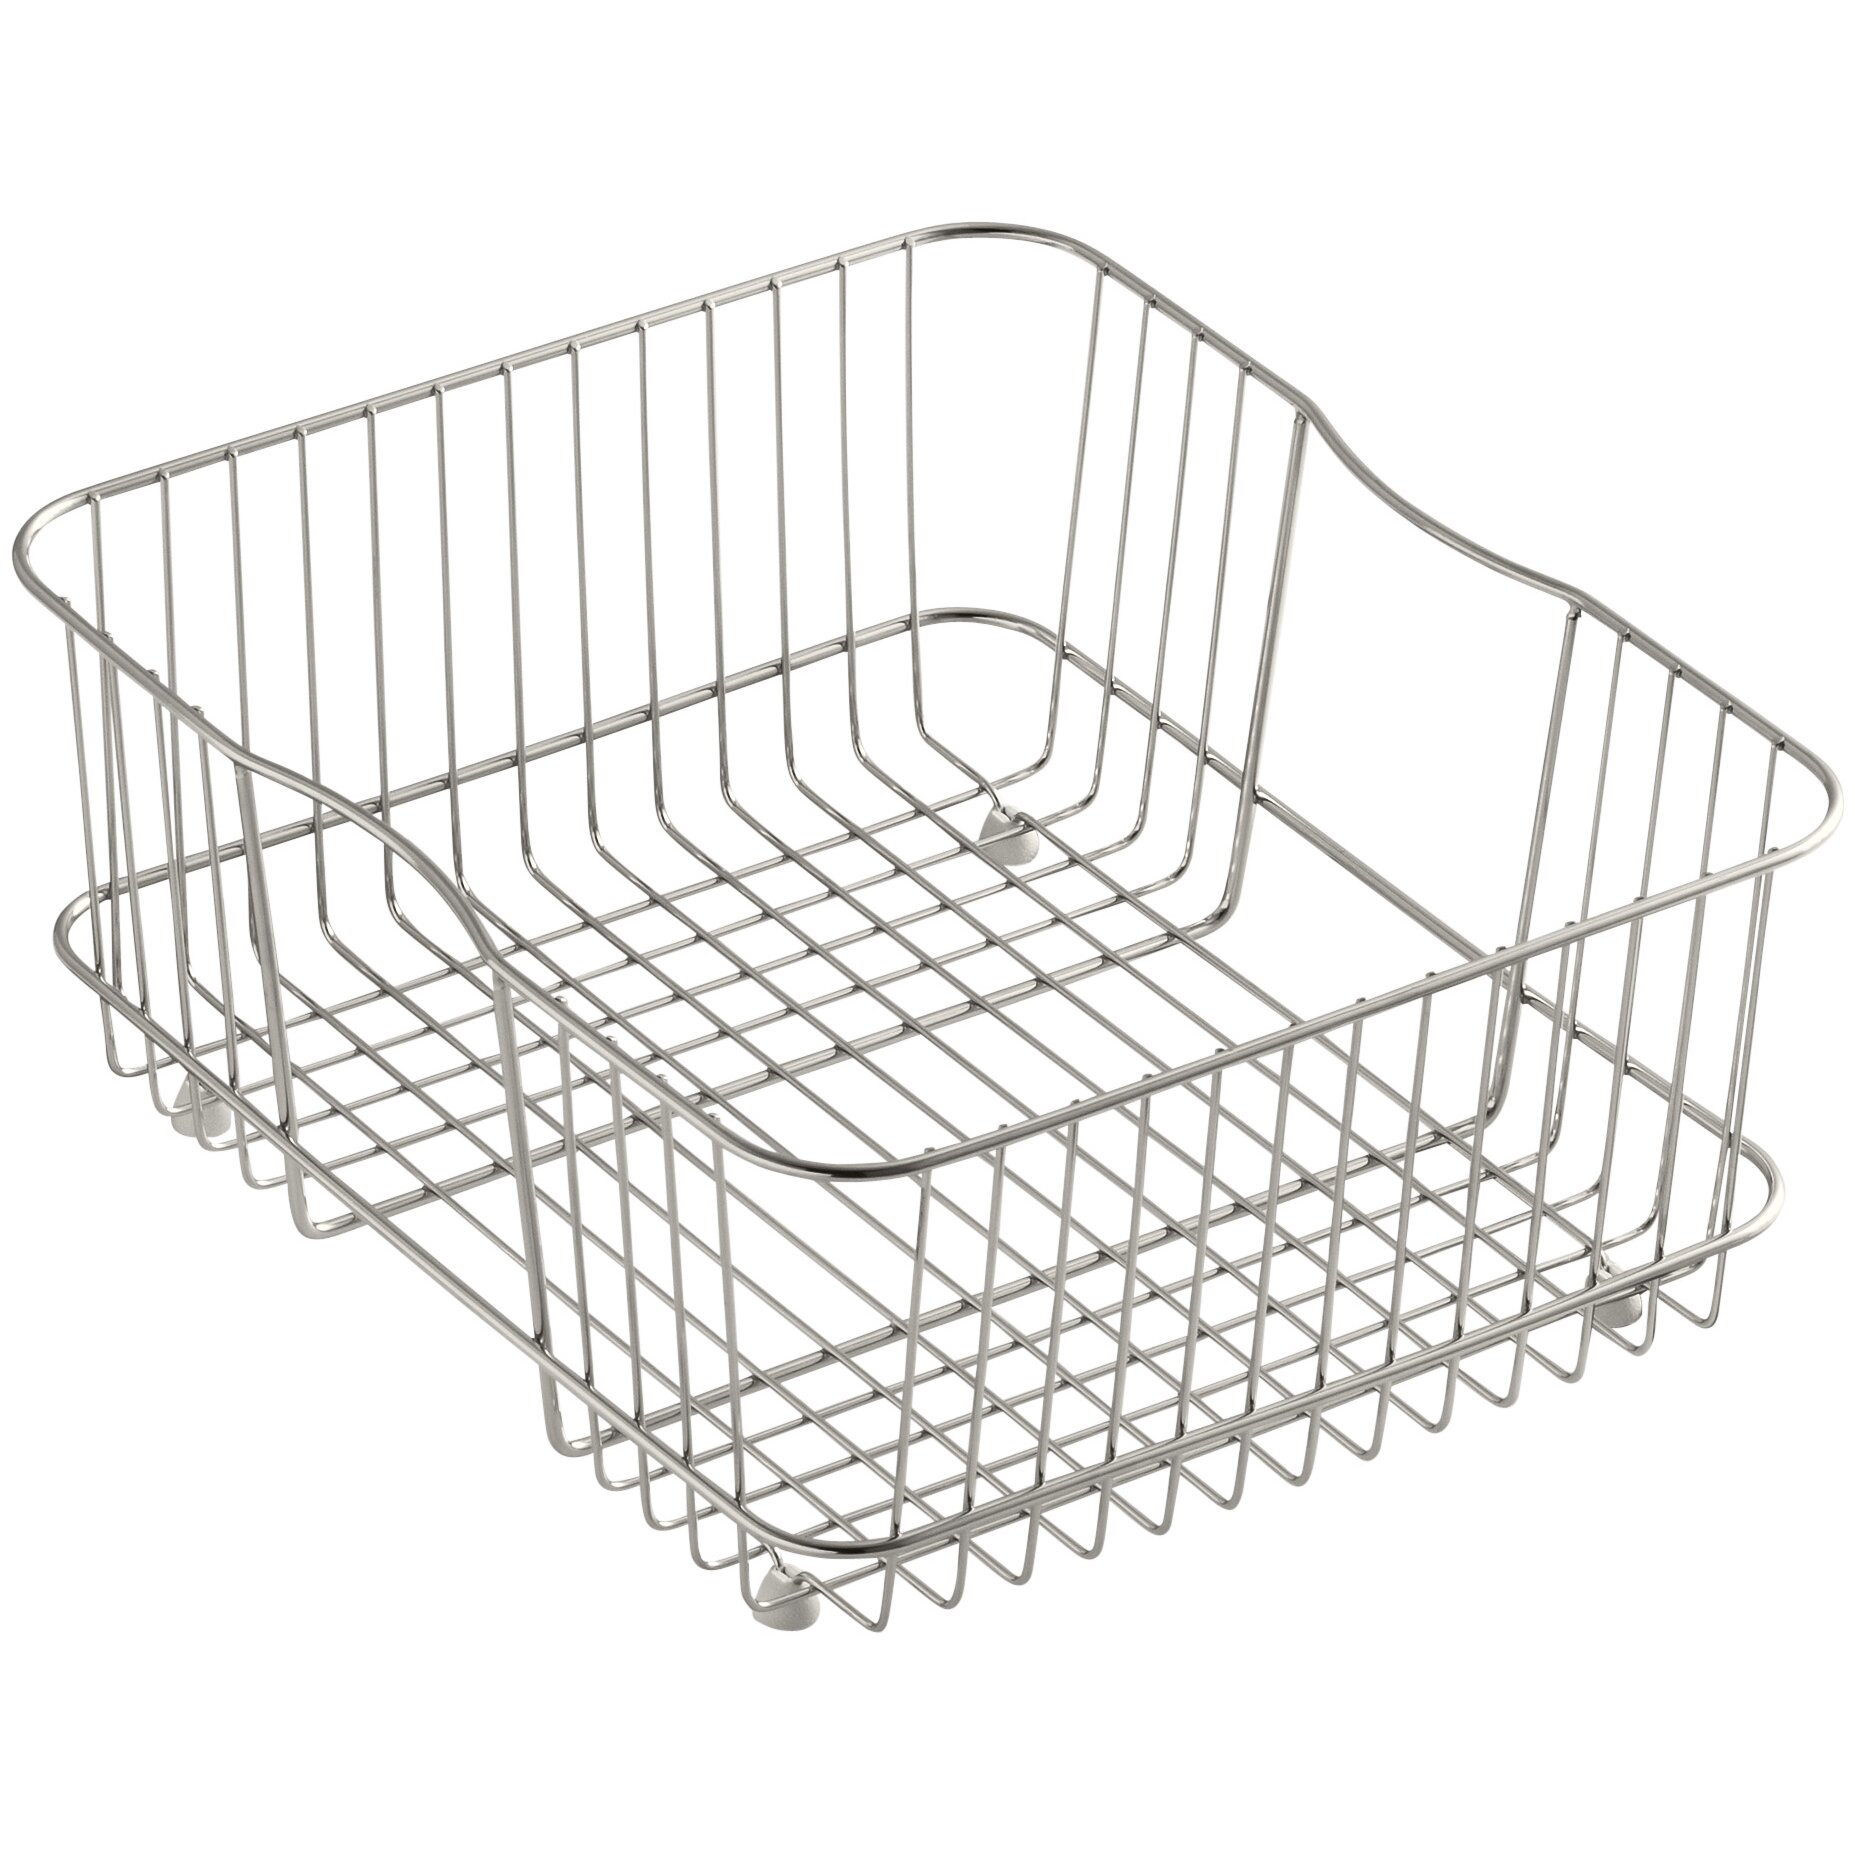 Kitchen Basket Kohler Coated Sink Basket For Undertone And Iron Tones Kitchen